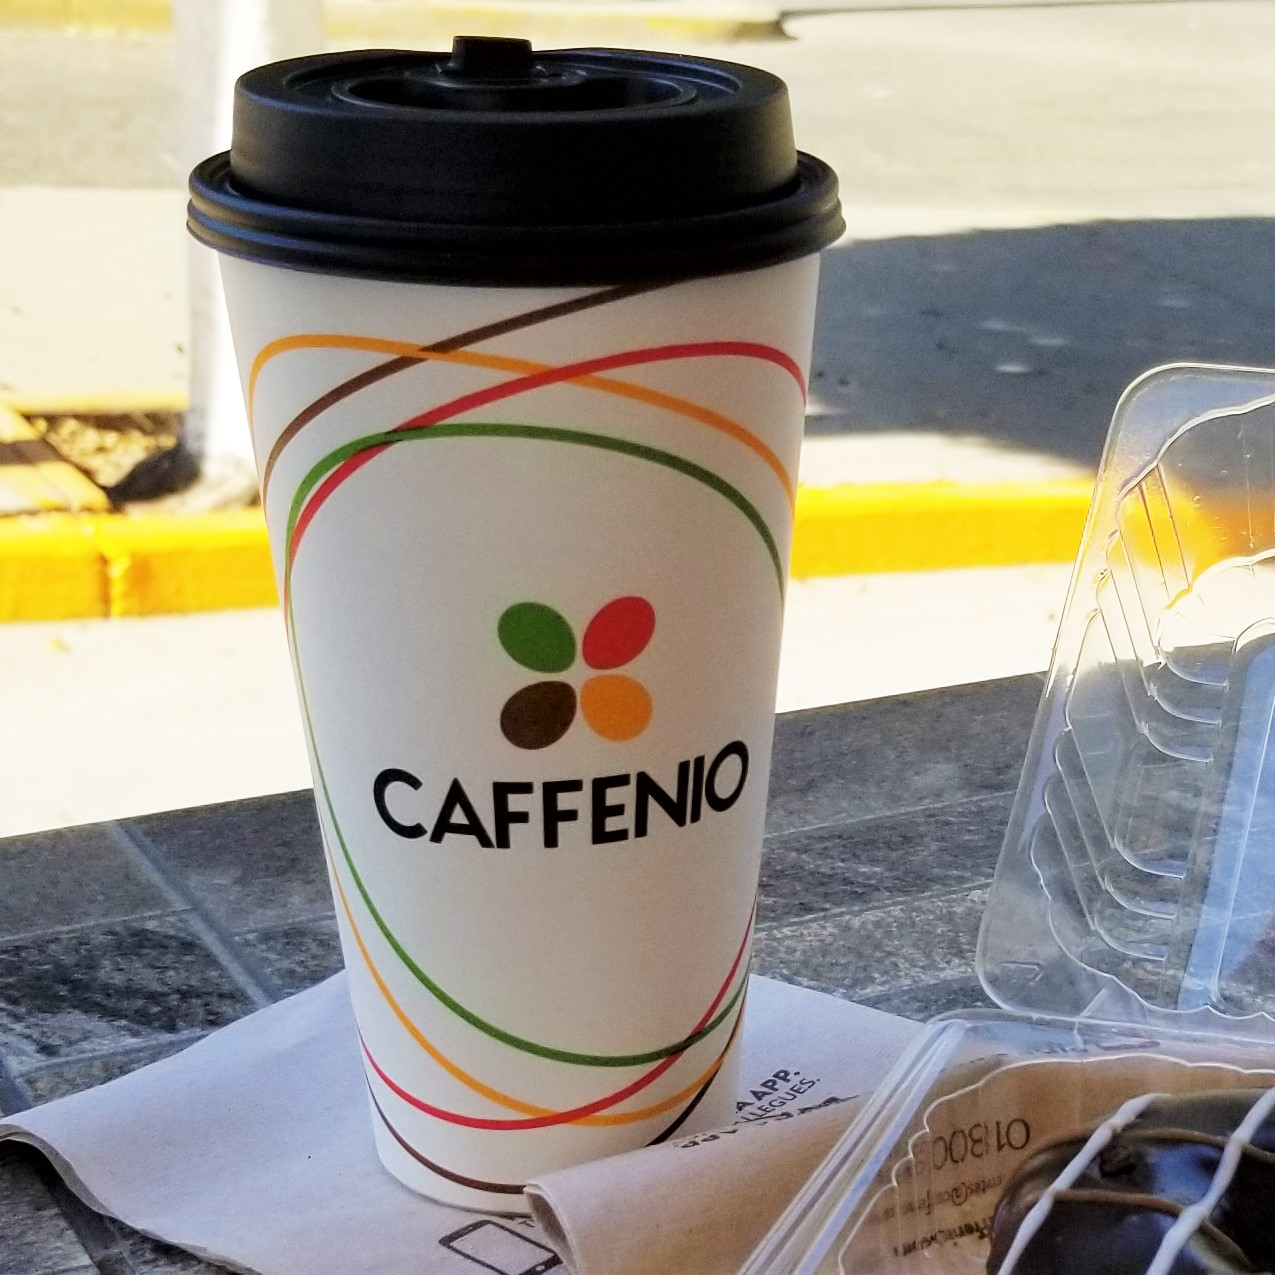 001 a Caffenio cup Culiacan 20190328